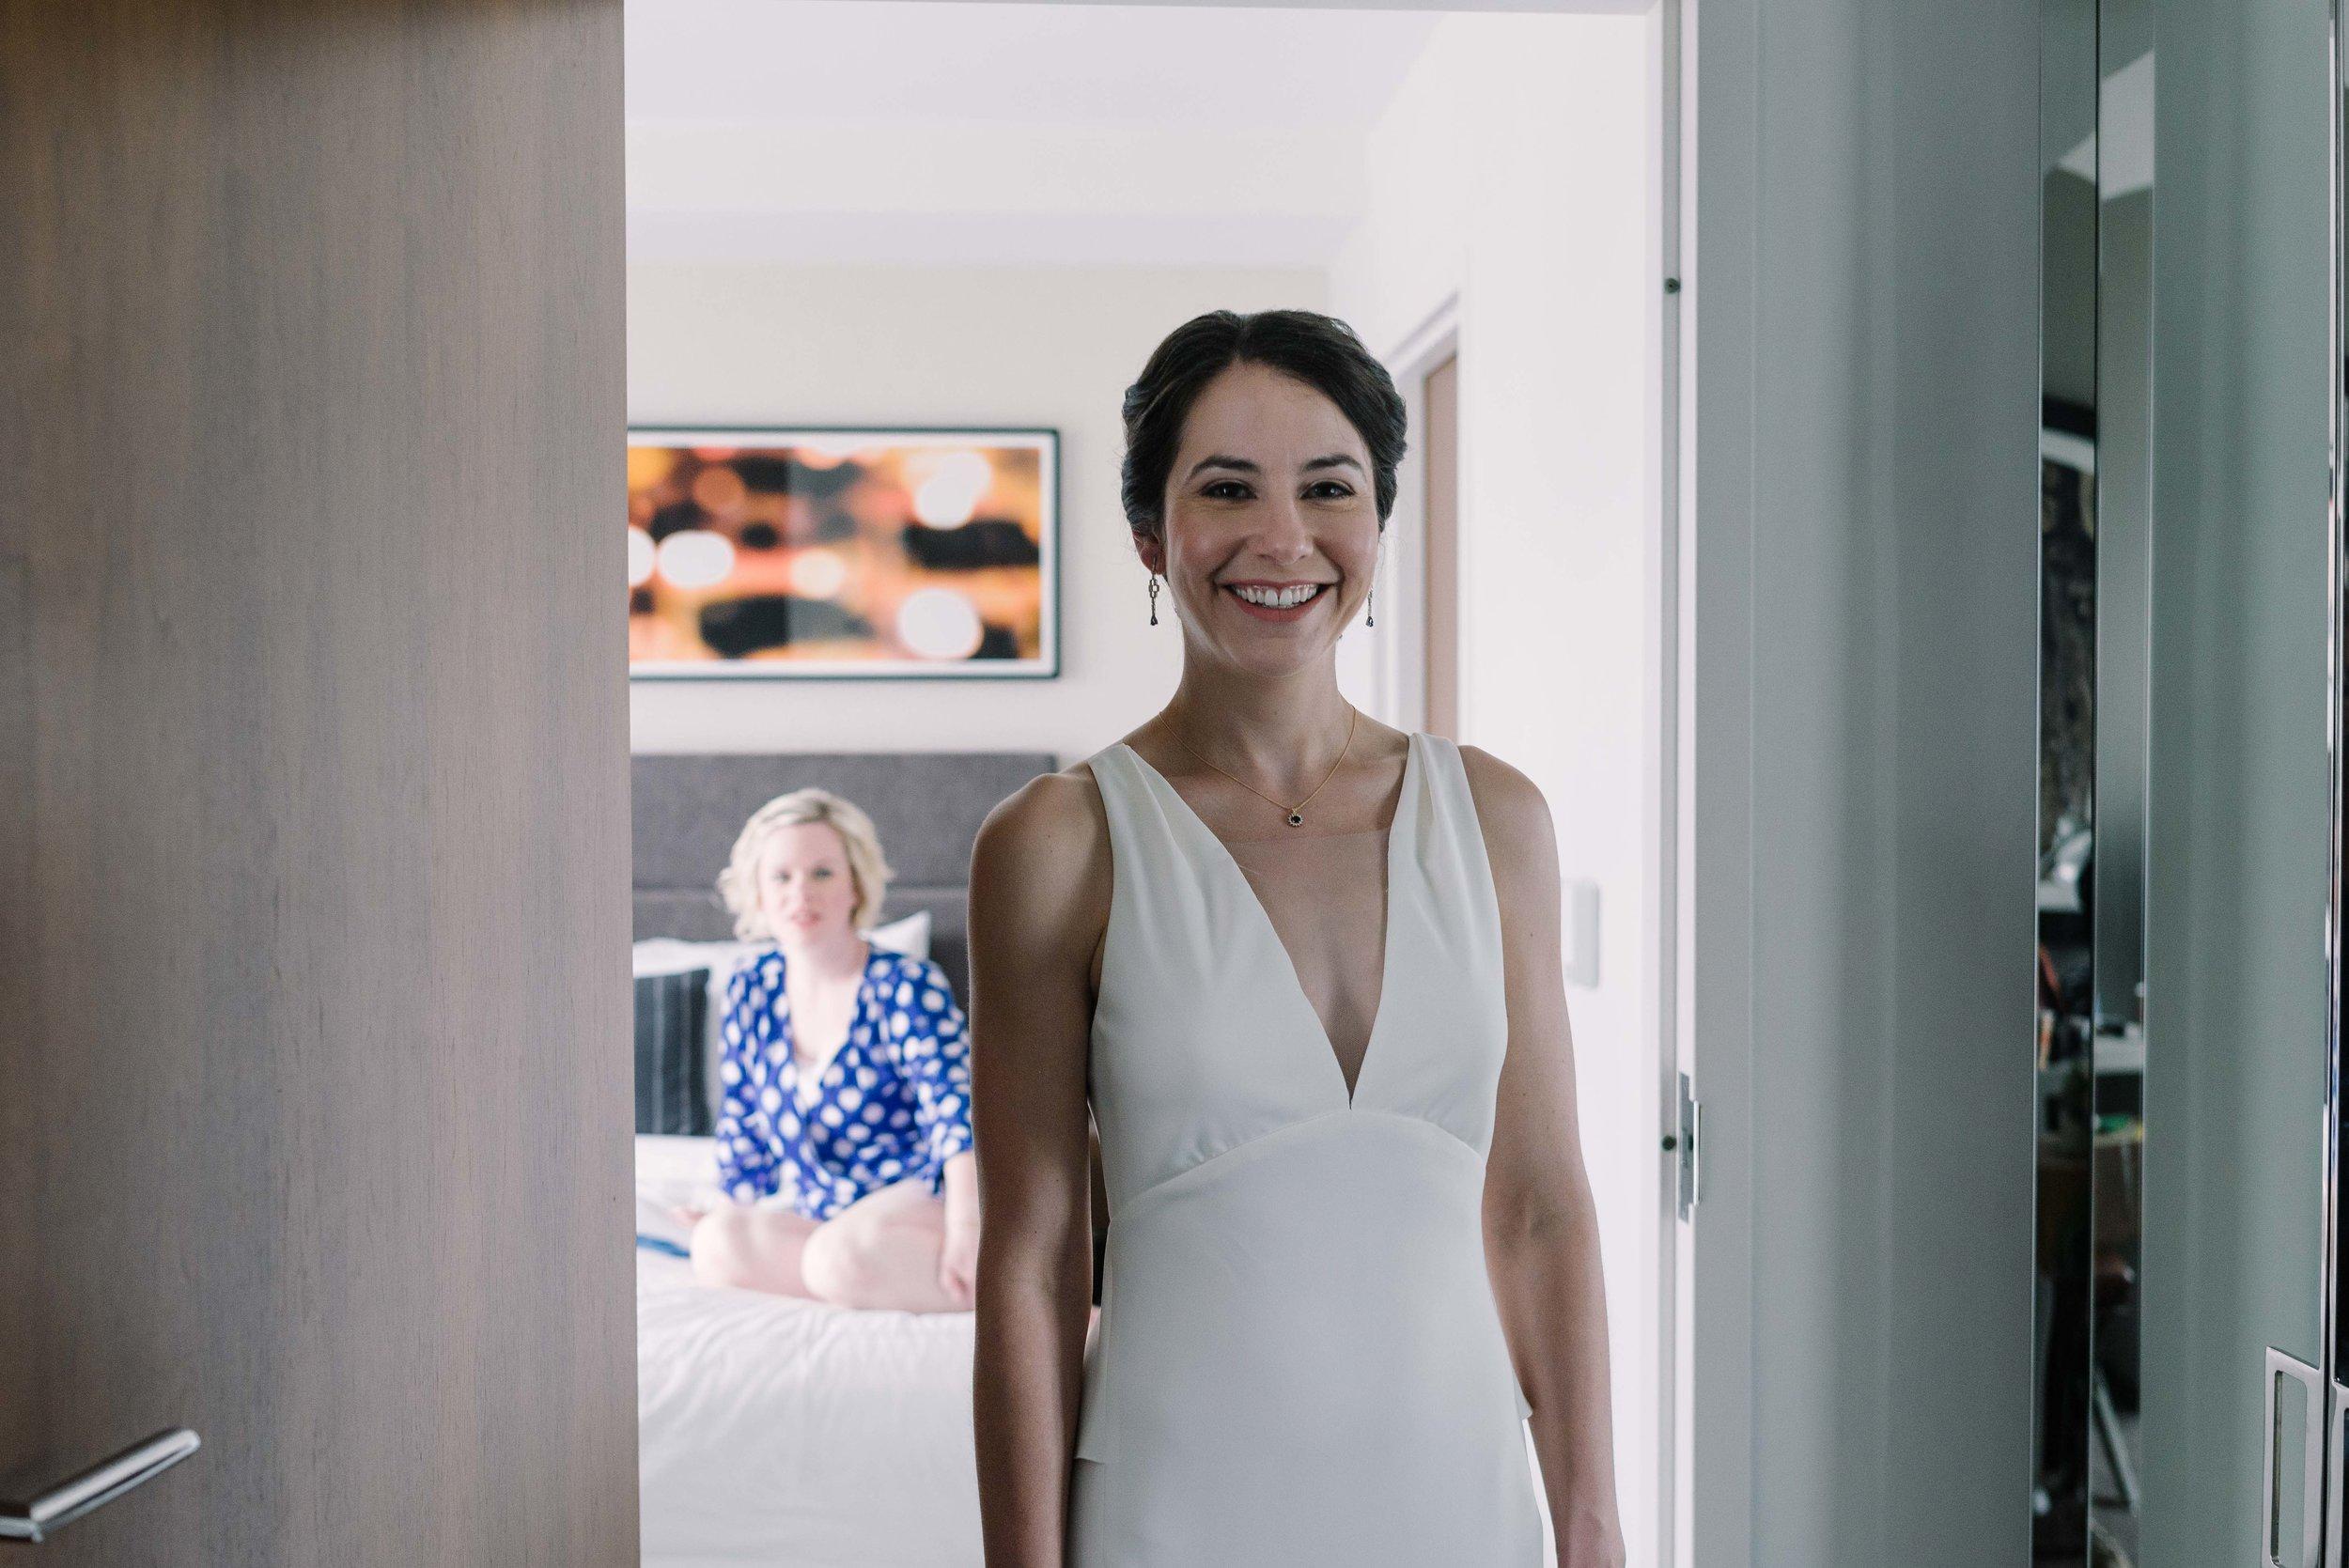 Patricia-Steve-Blog-Indianapolis-Wedding-24.jpg